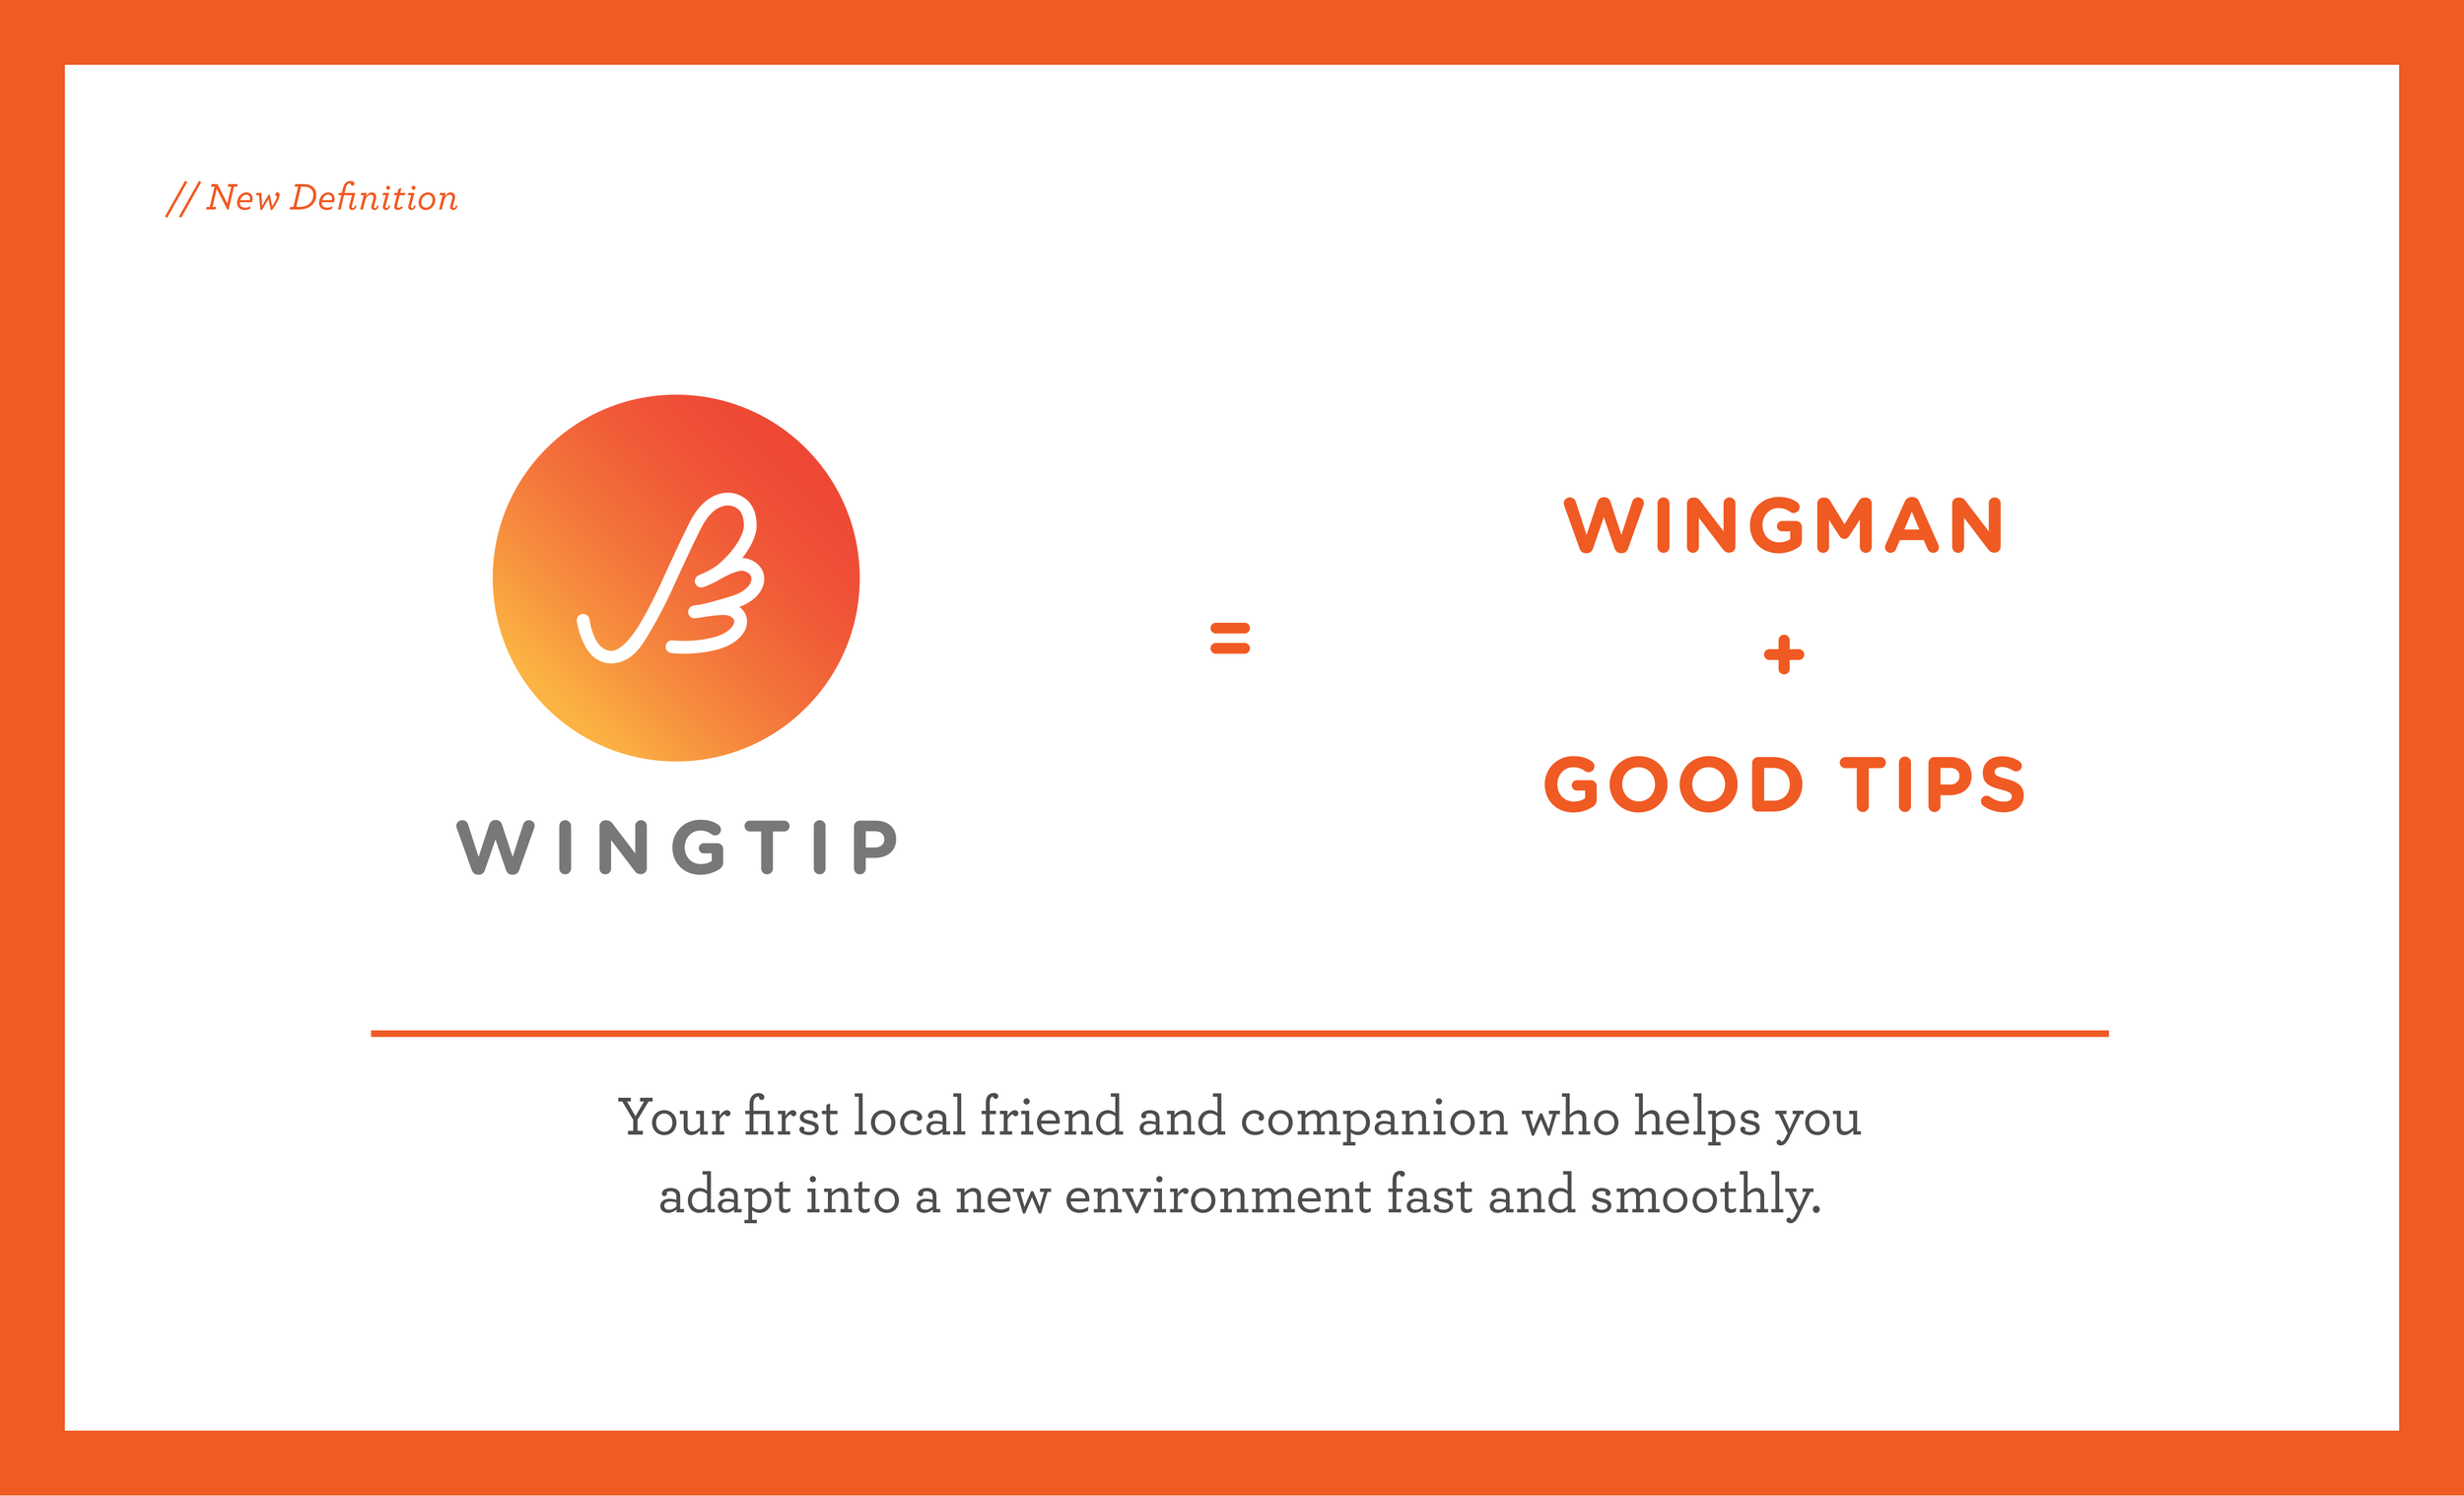 wingtip definition.png